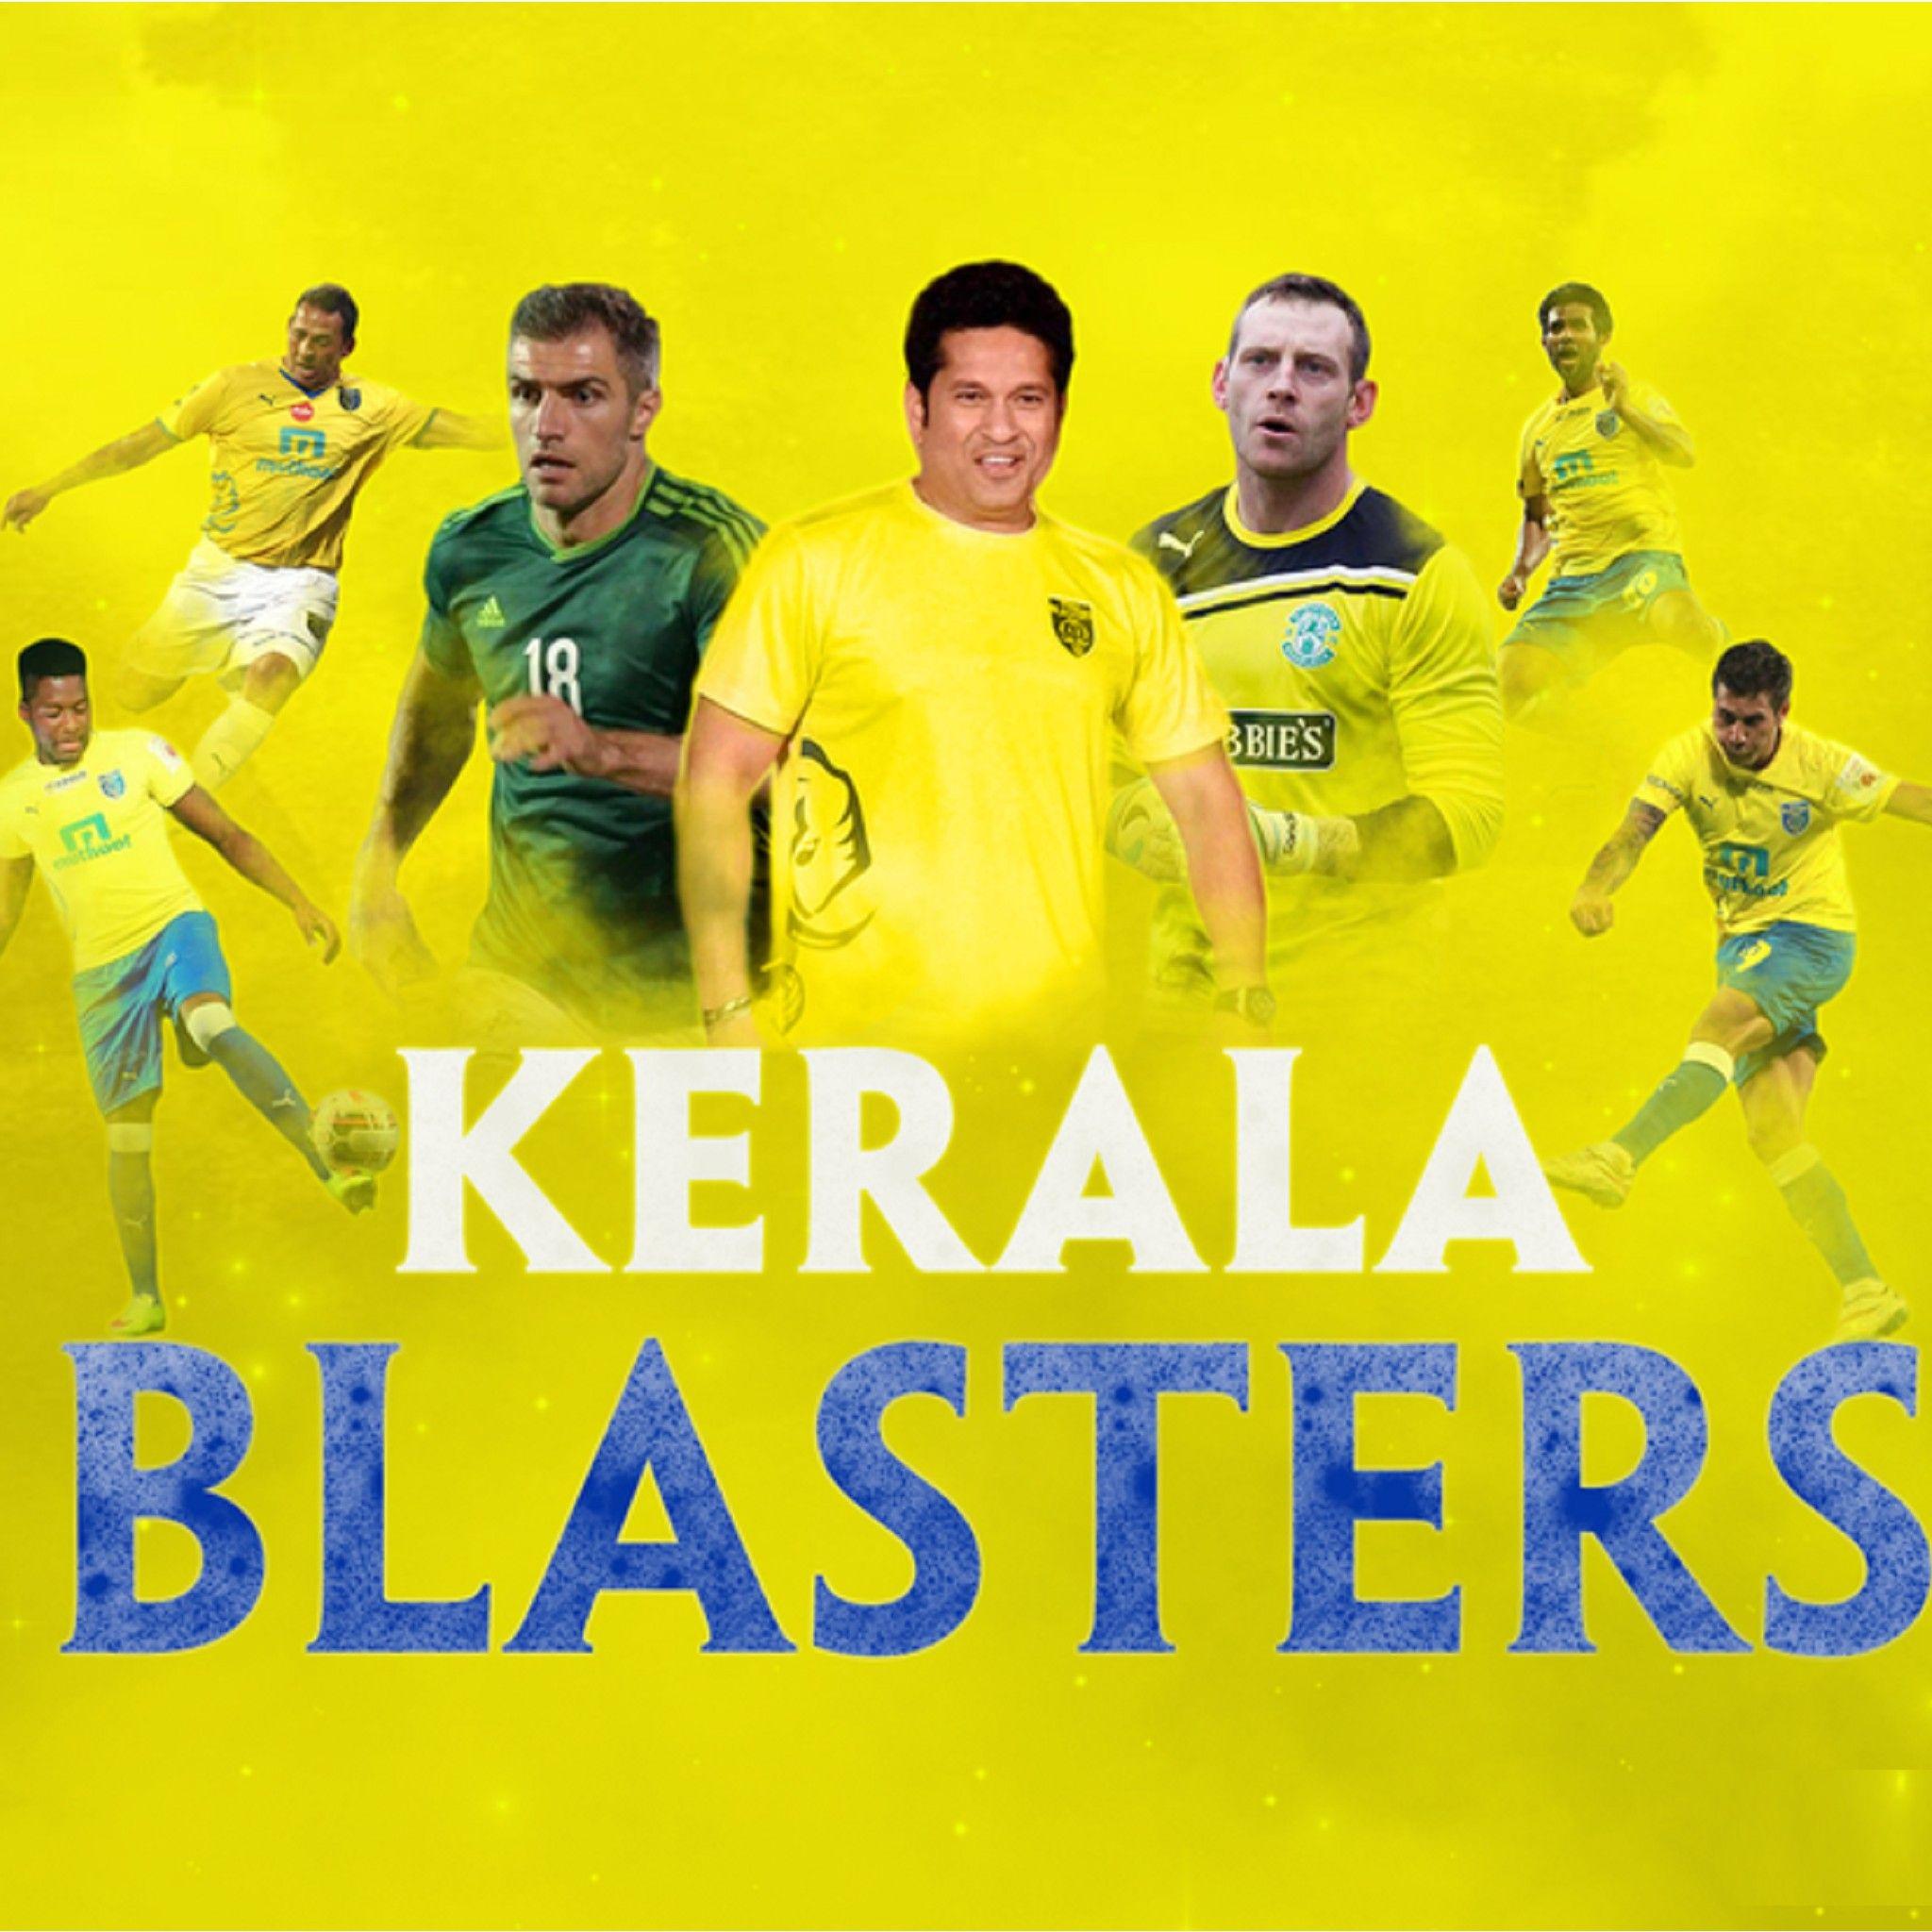 Download Kerala Blasters Team 2048 X 2048 Wallpapers   Kerala 2048x2048